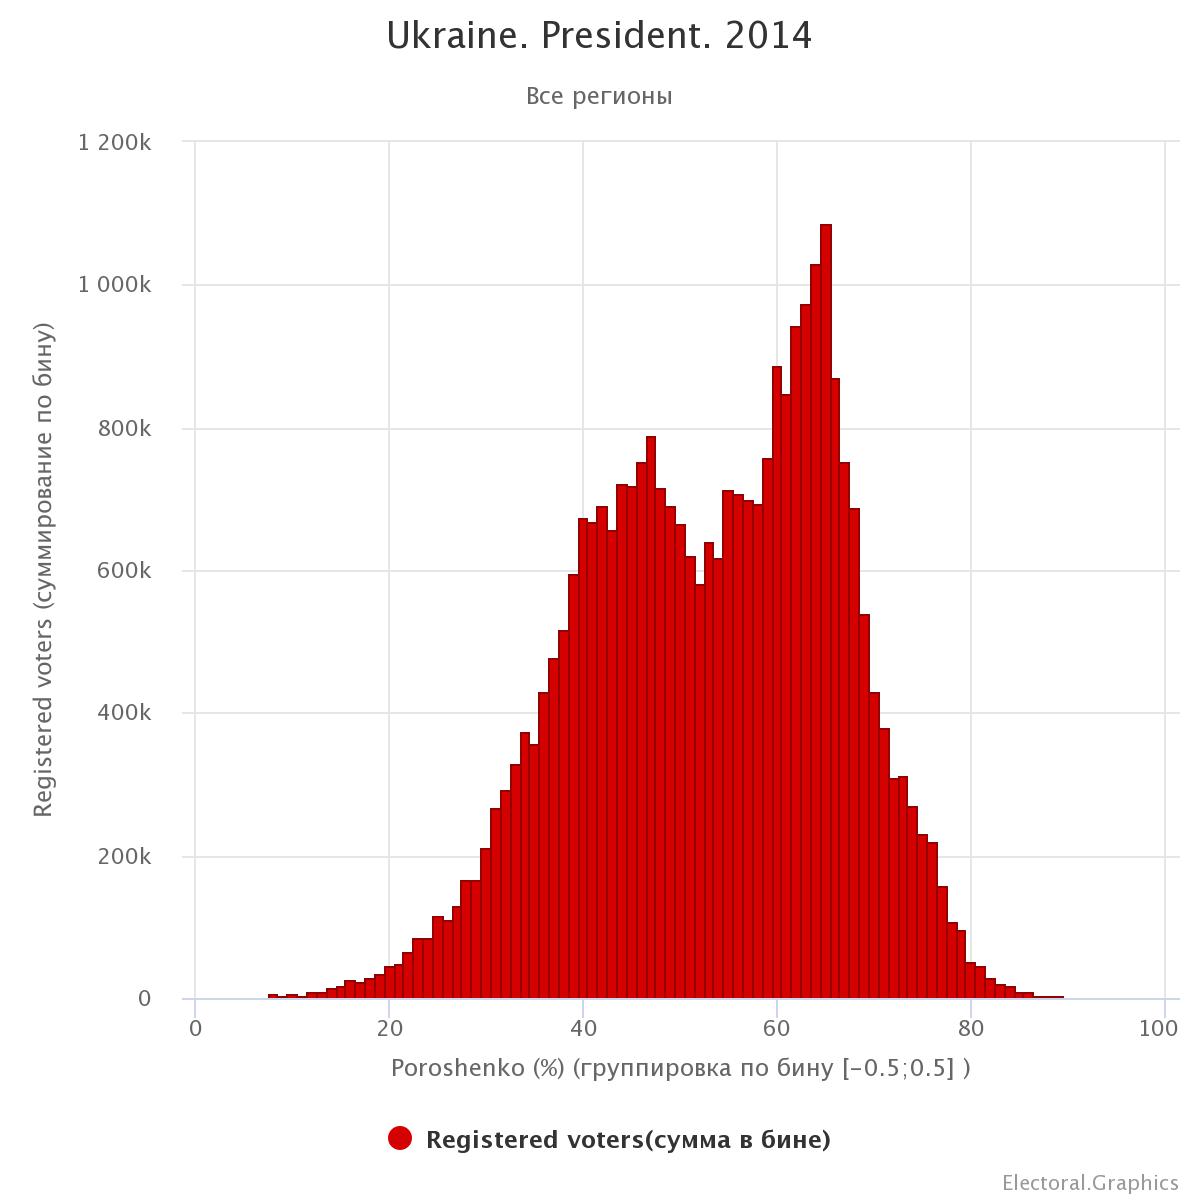 ukraine-president-2014 (5).png